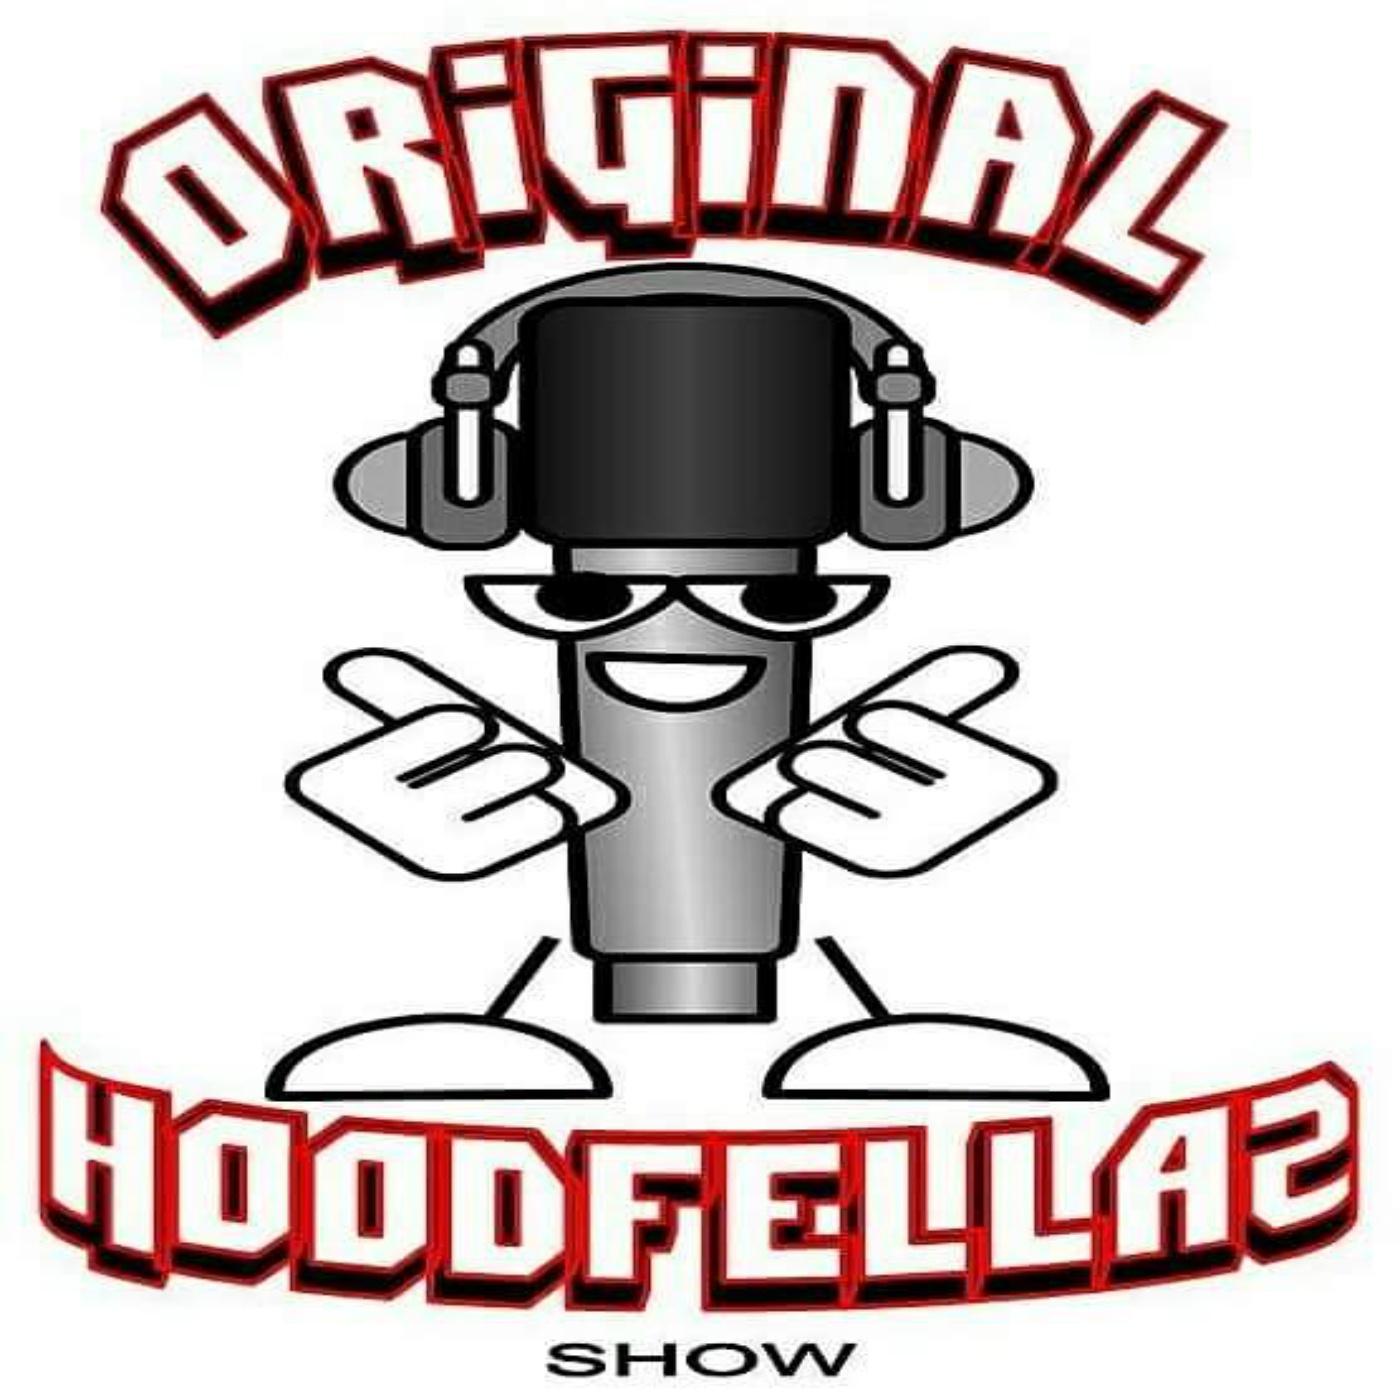 OG HoodFellaz